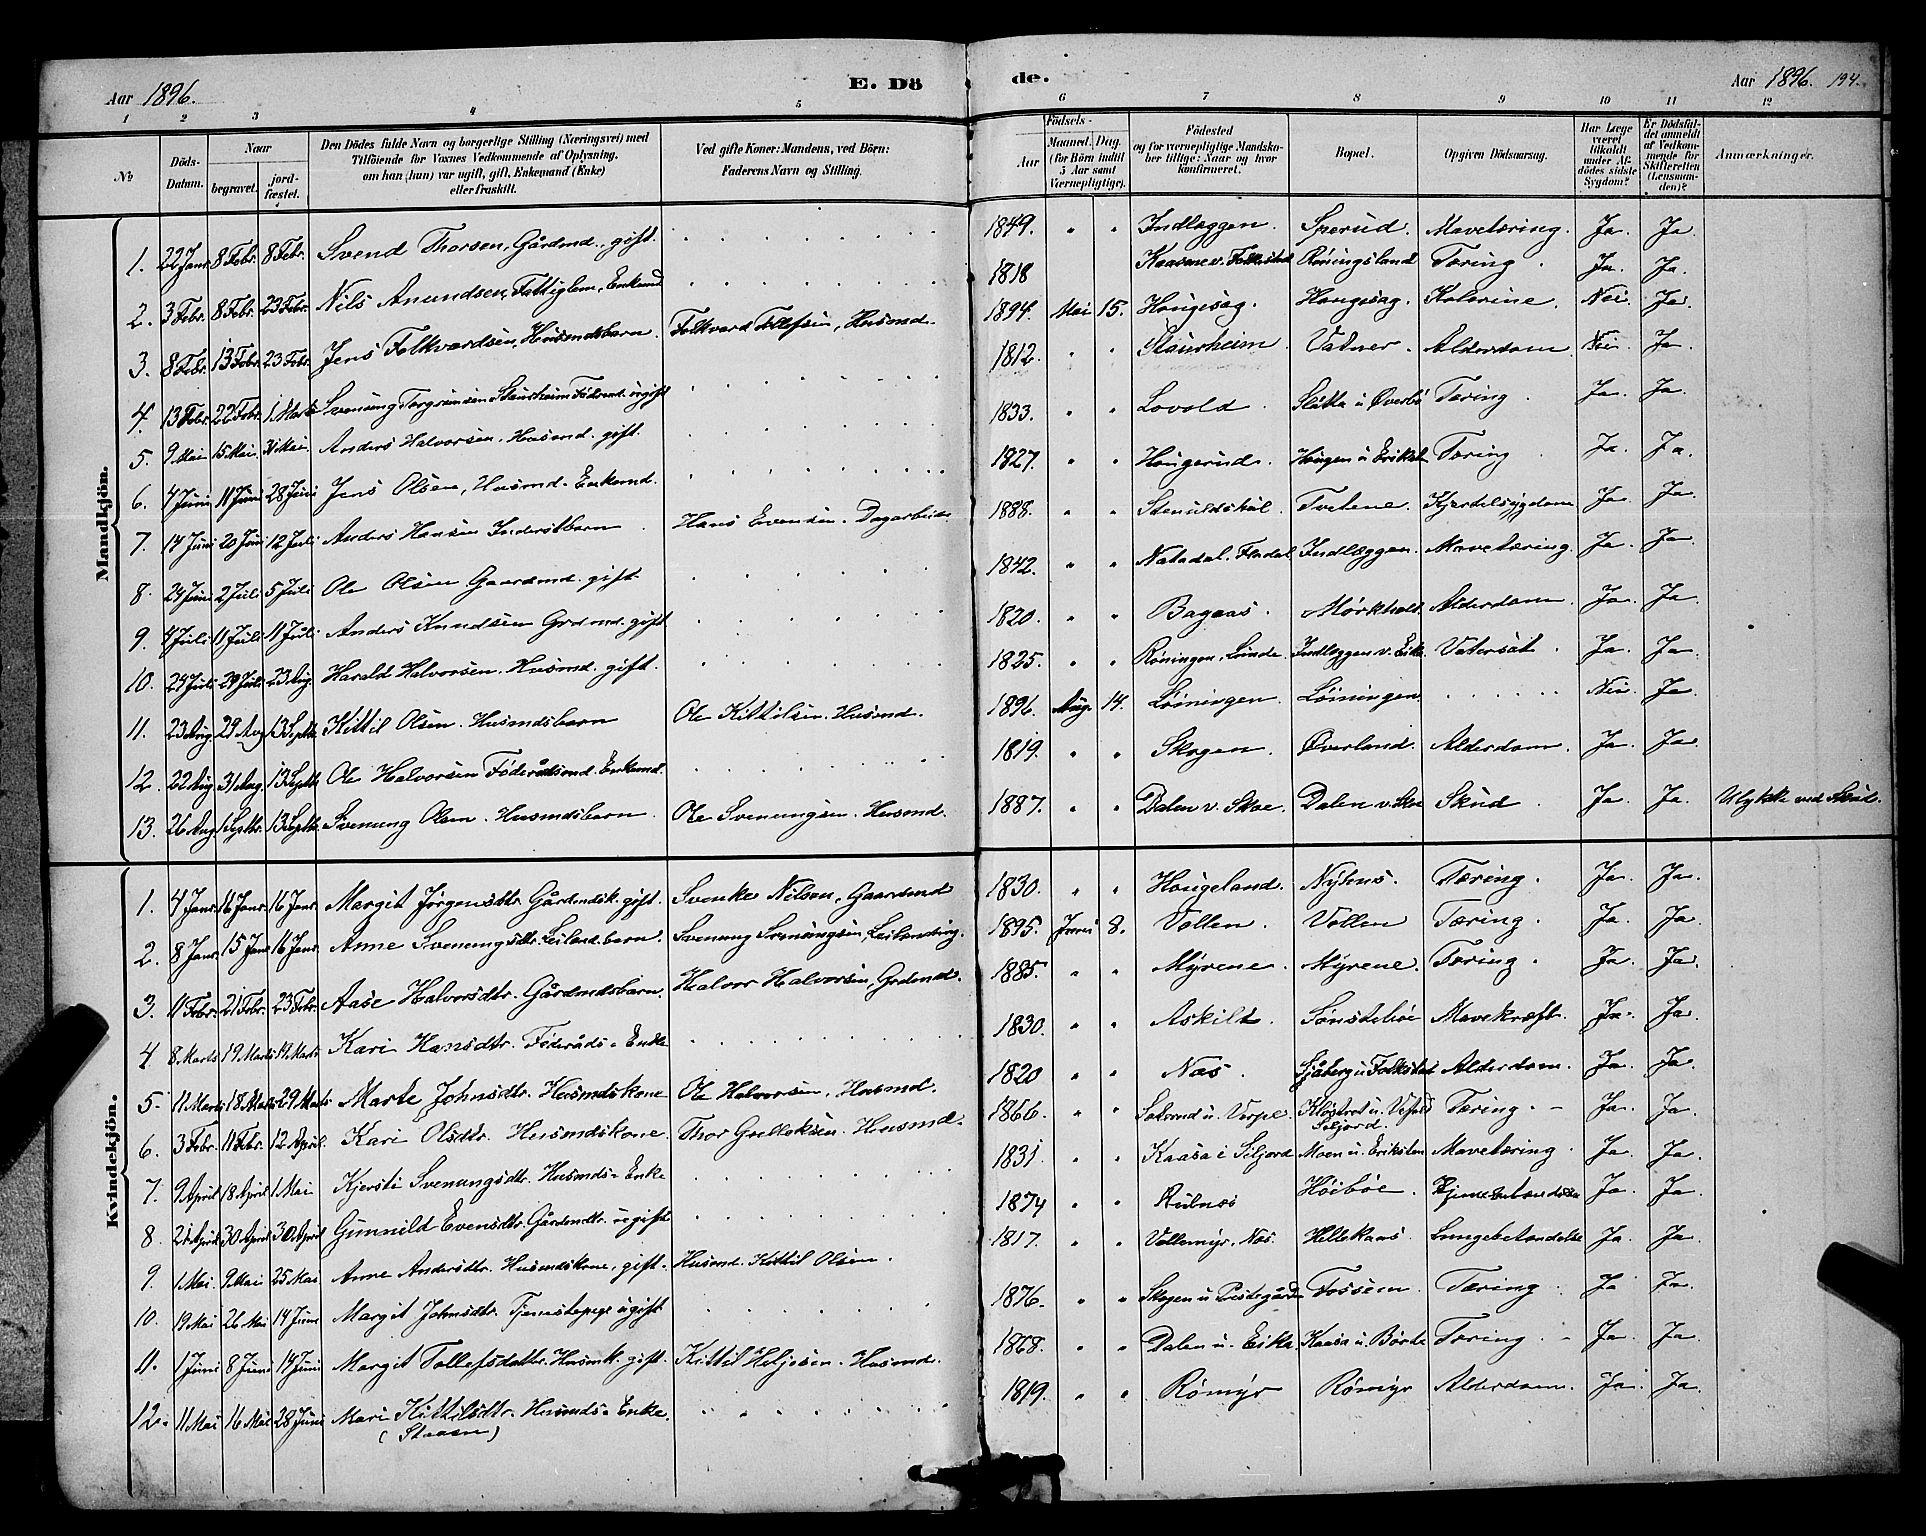 SAKO, Bø kirkebøker, G/Ga/L0005: Klokkerbok nr. 5, 1883-1897, s. 194